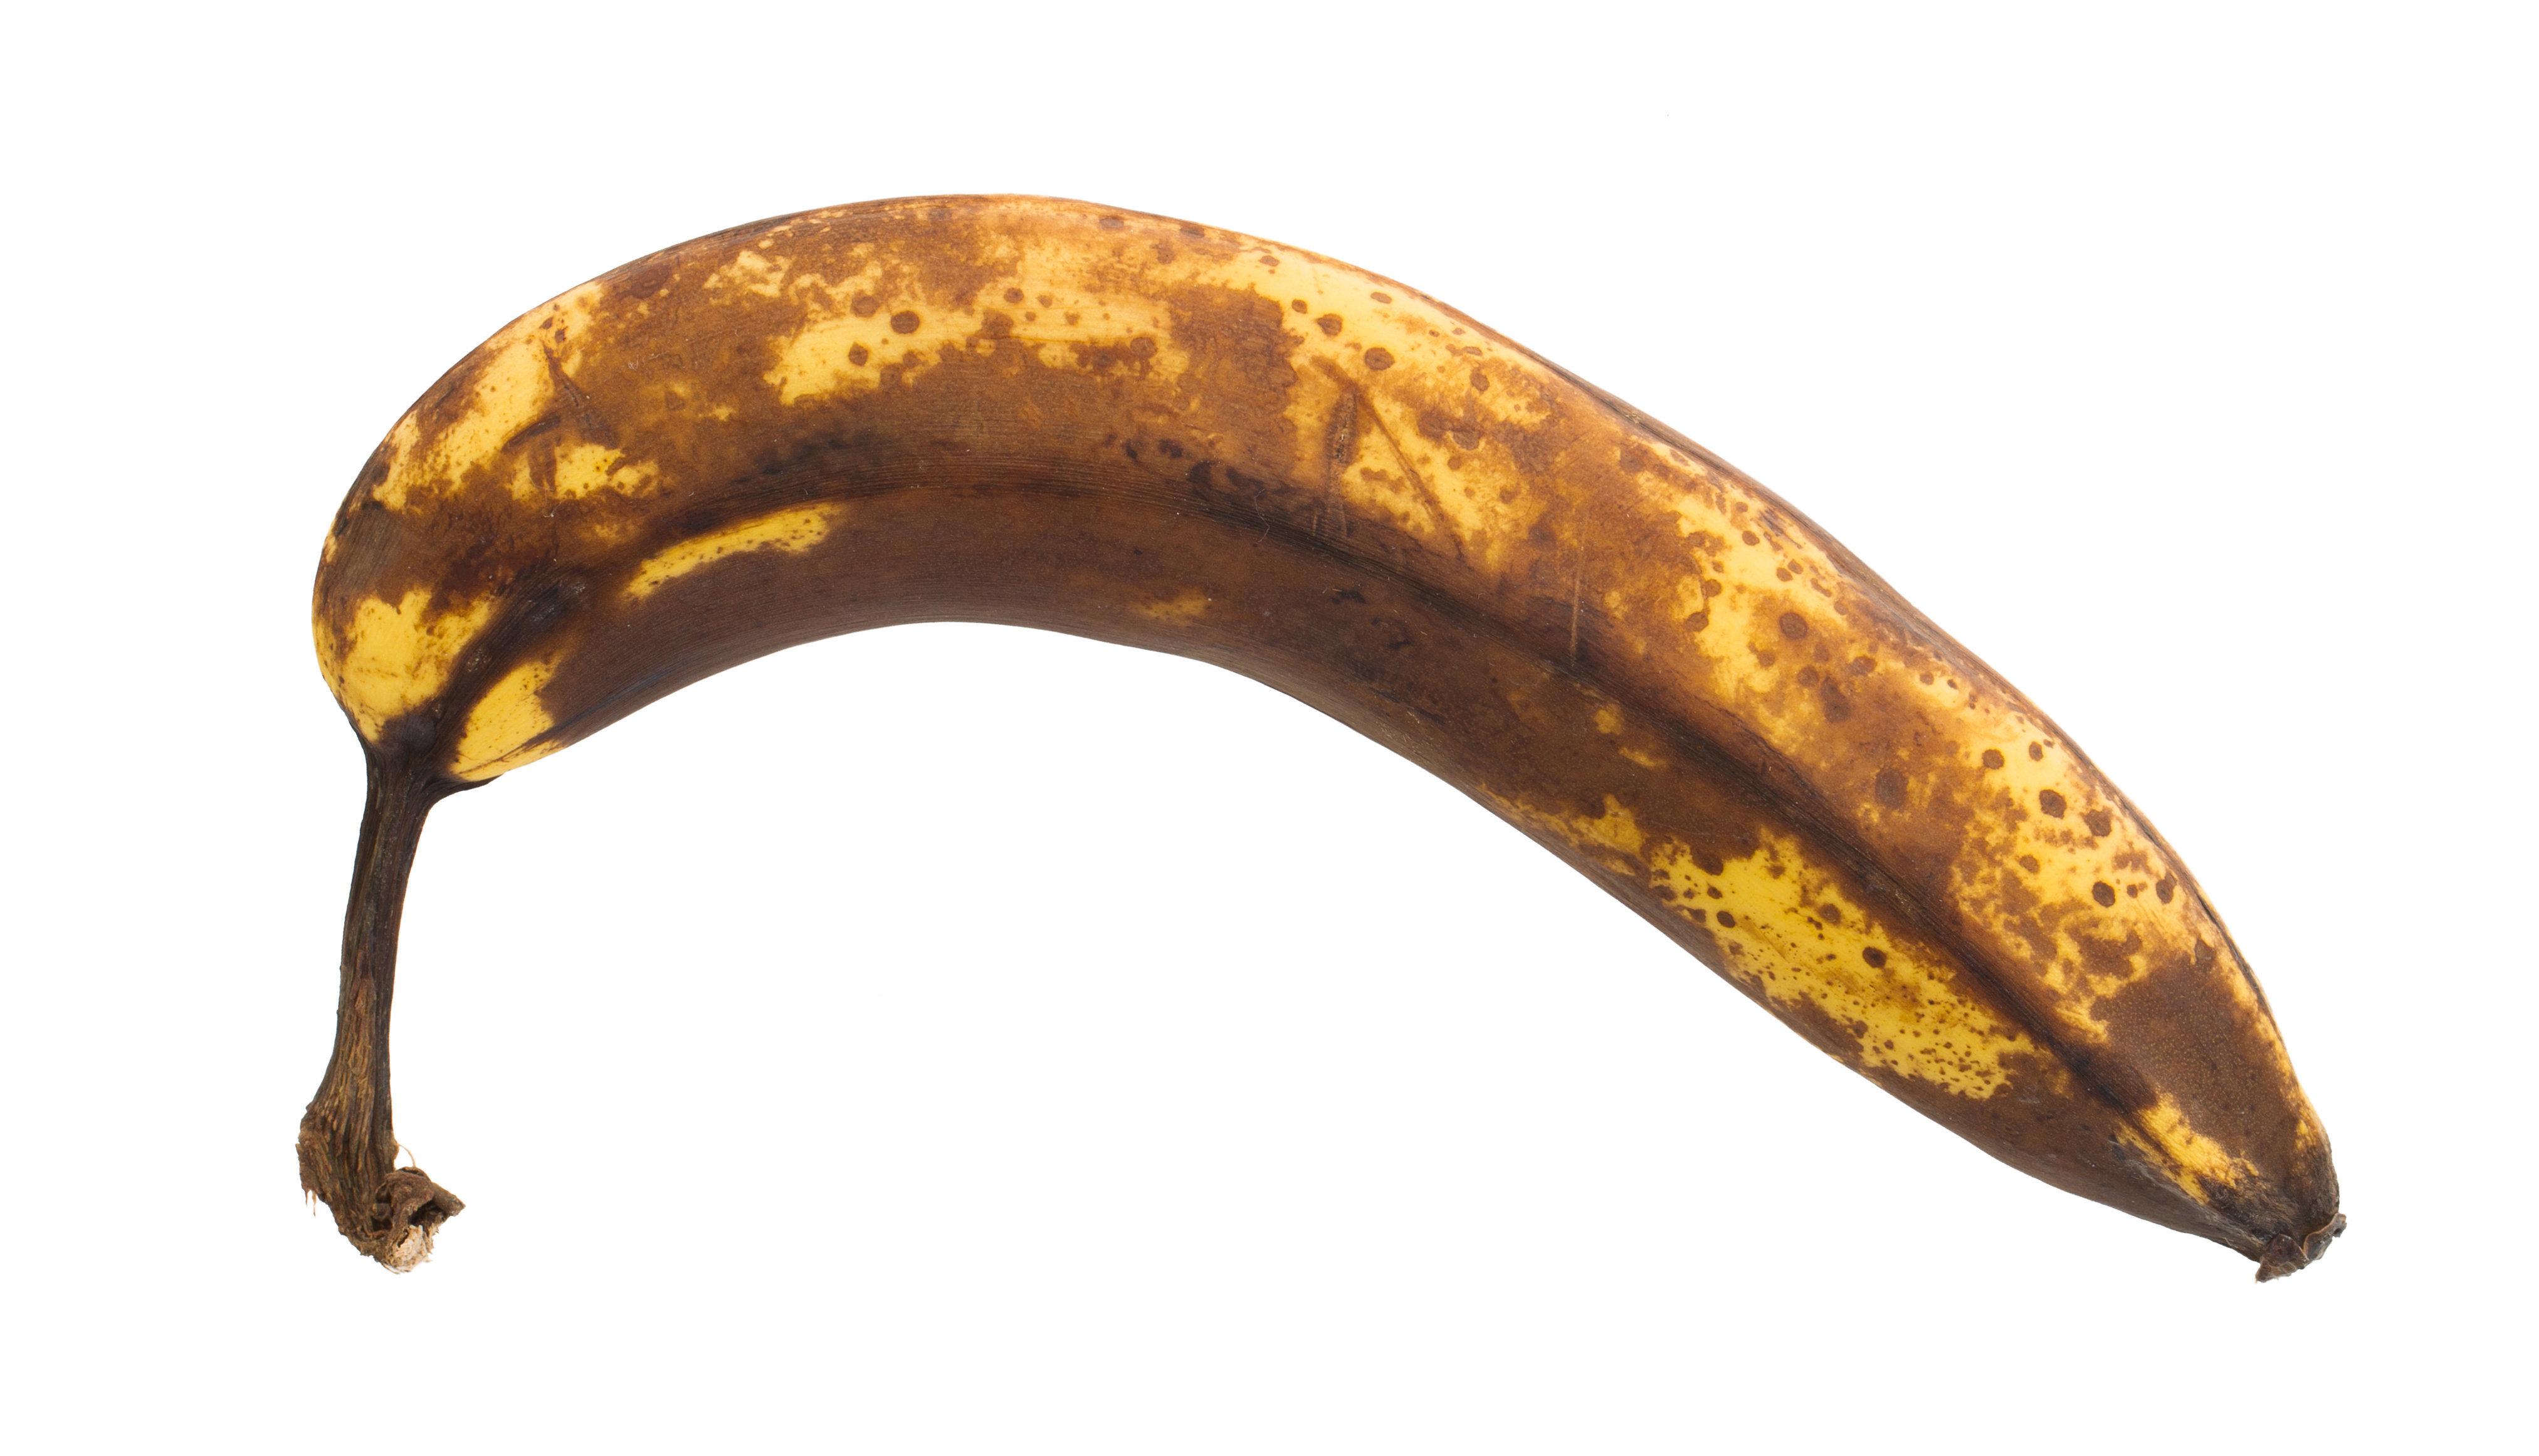 Over ripe banana, isolated on white background